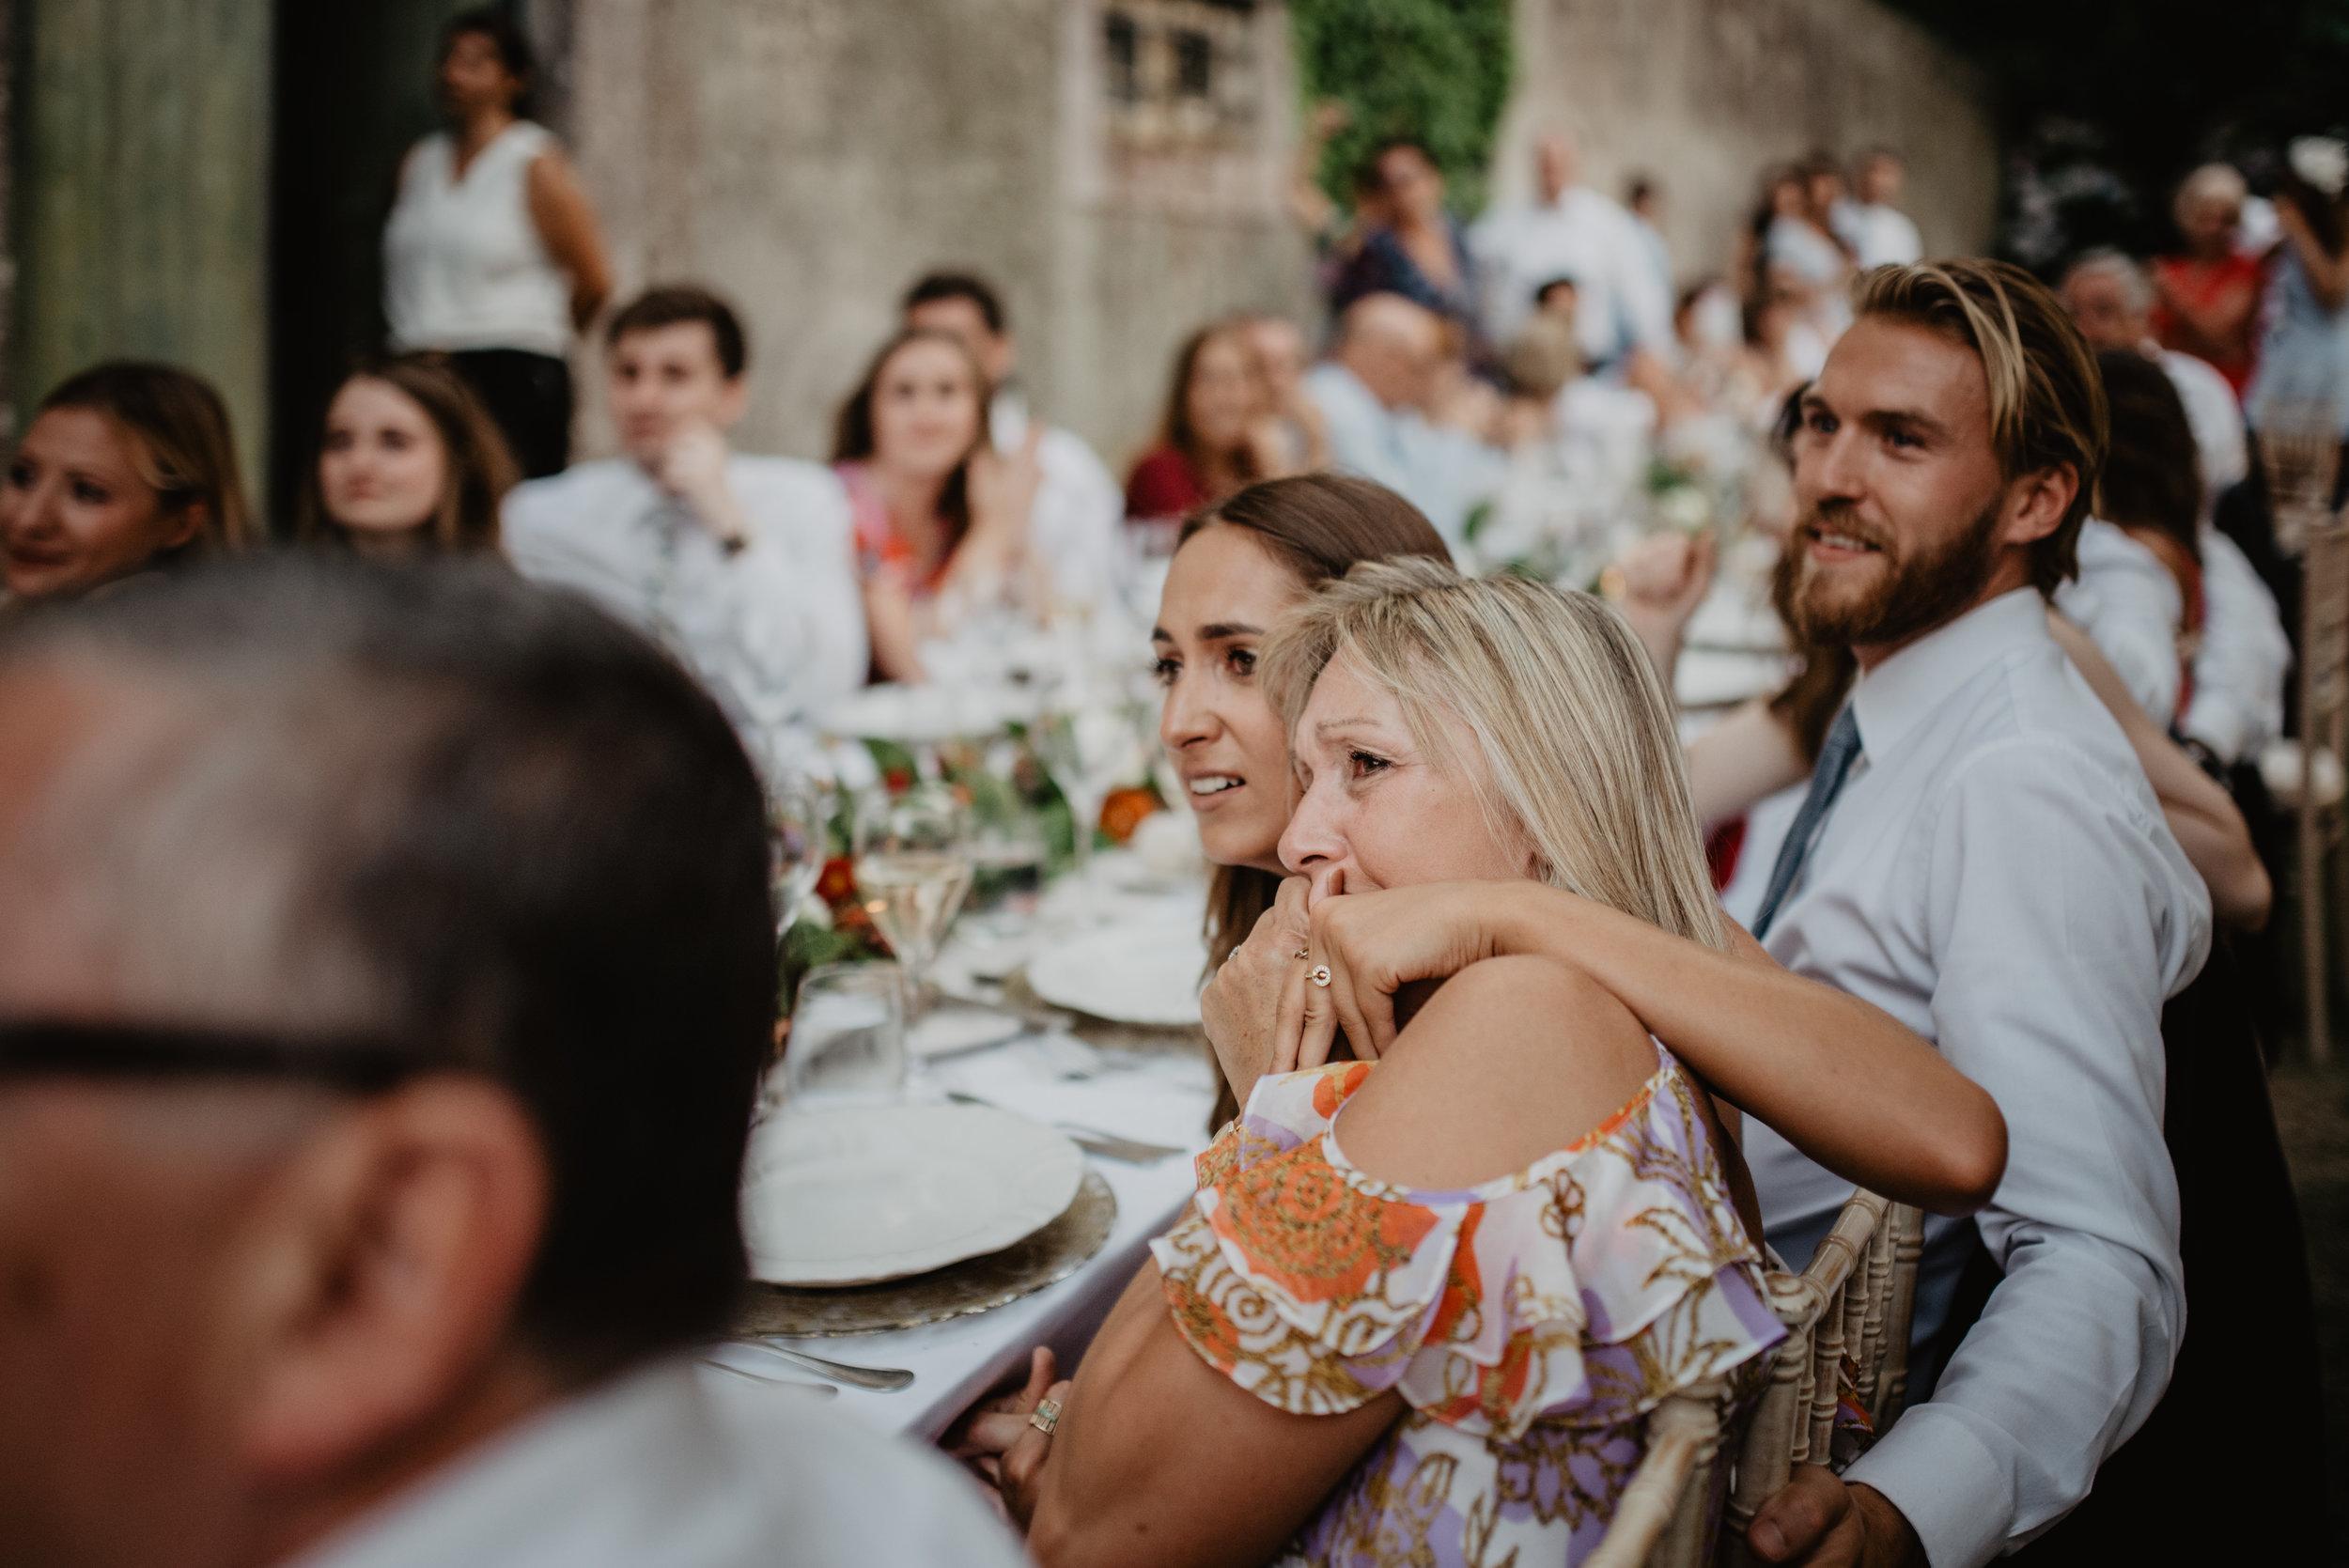 Lapela-photography-wedding-sintra-portugal-113.jpg